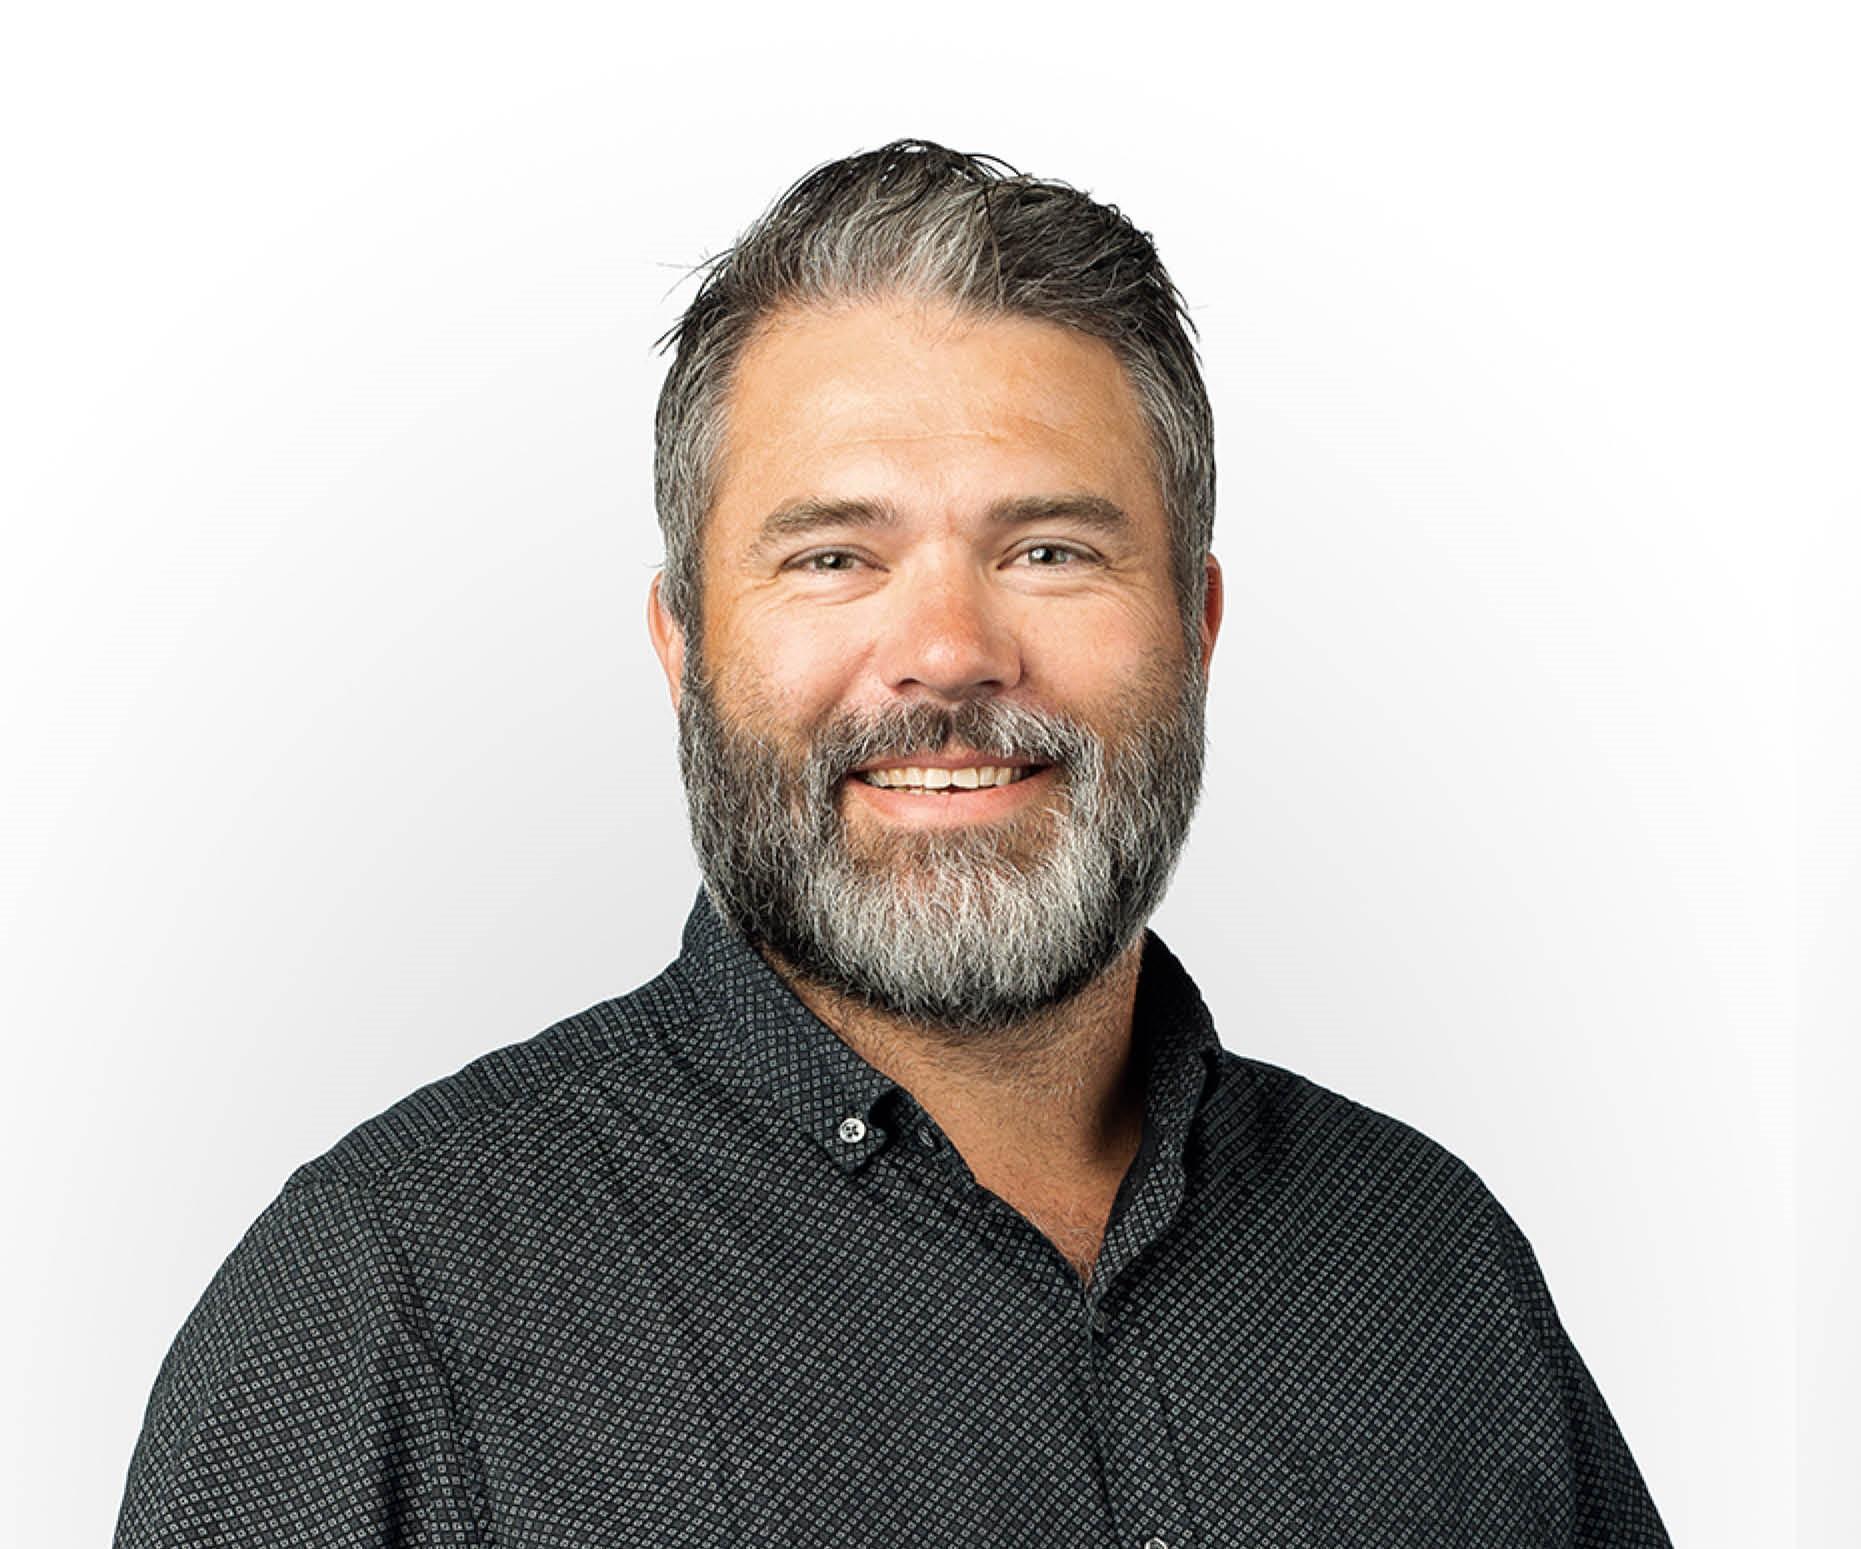 Ole-Morten G. Mouridsen